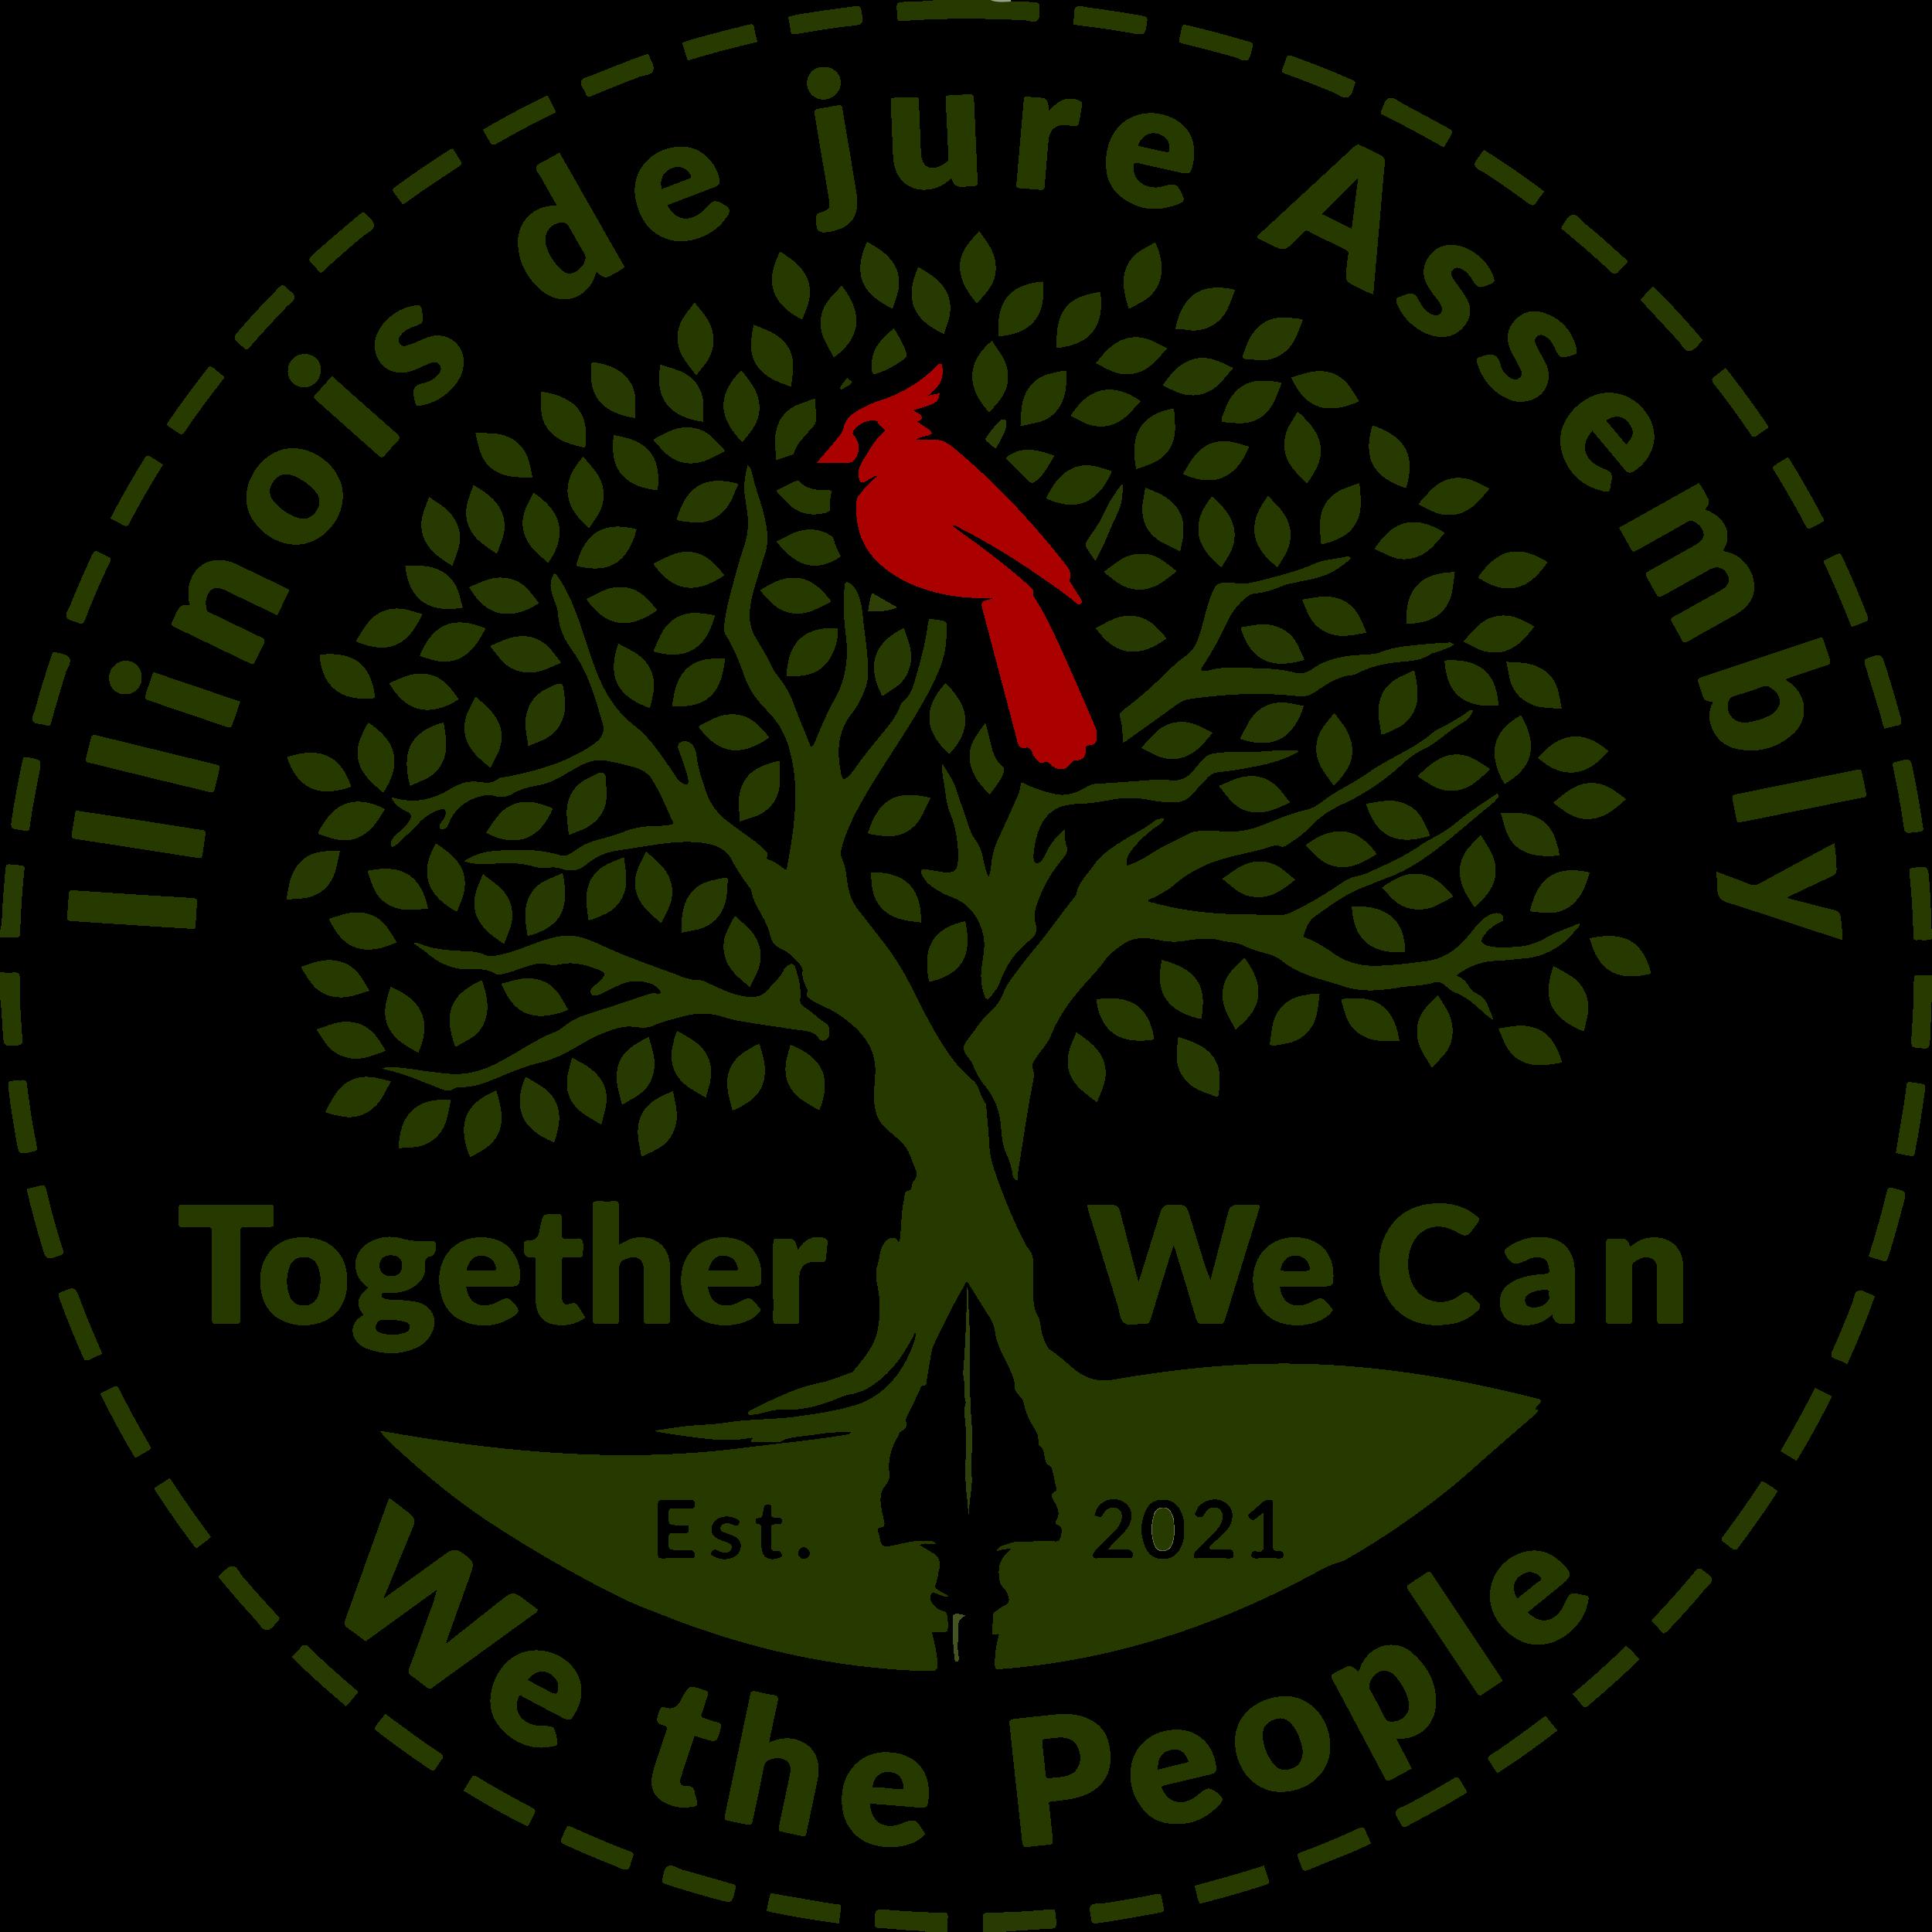 Illinois De jure Assembly